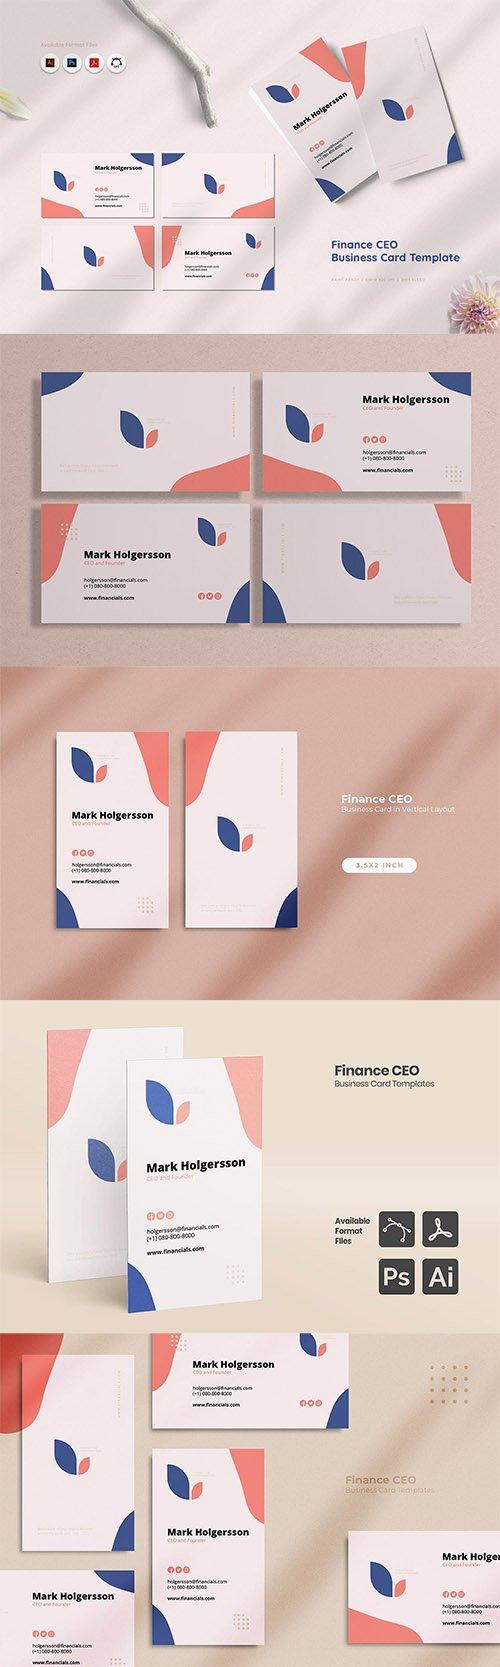 Finance CEO Business Card